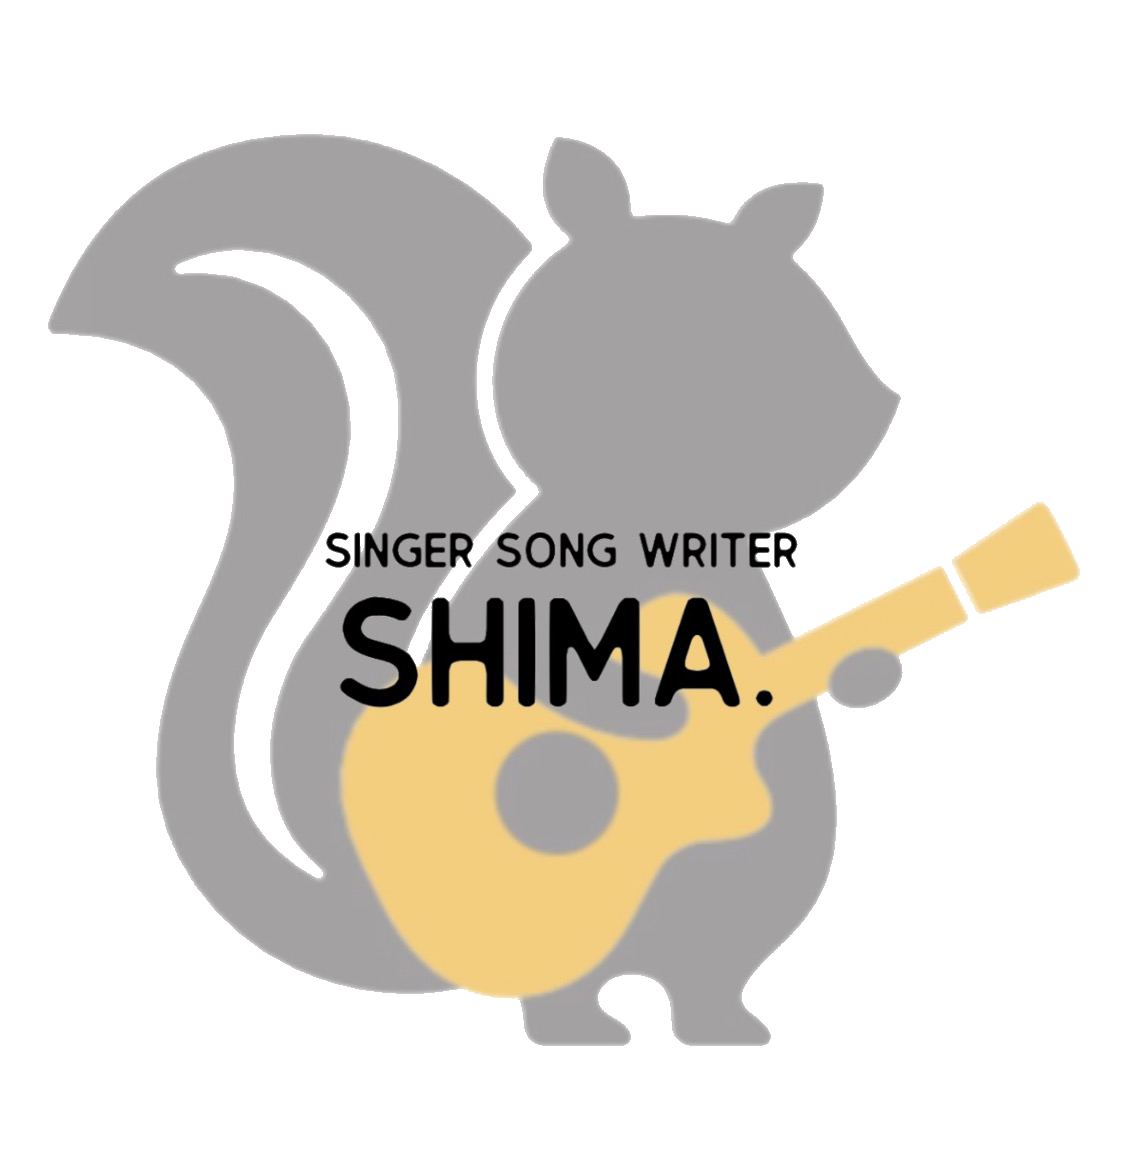 SHIMA.